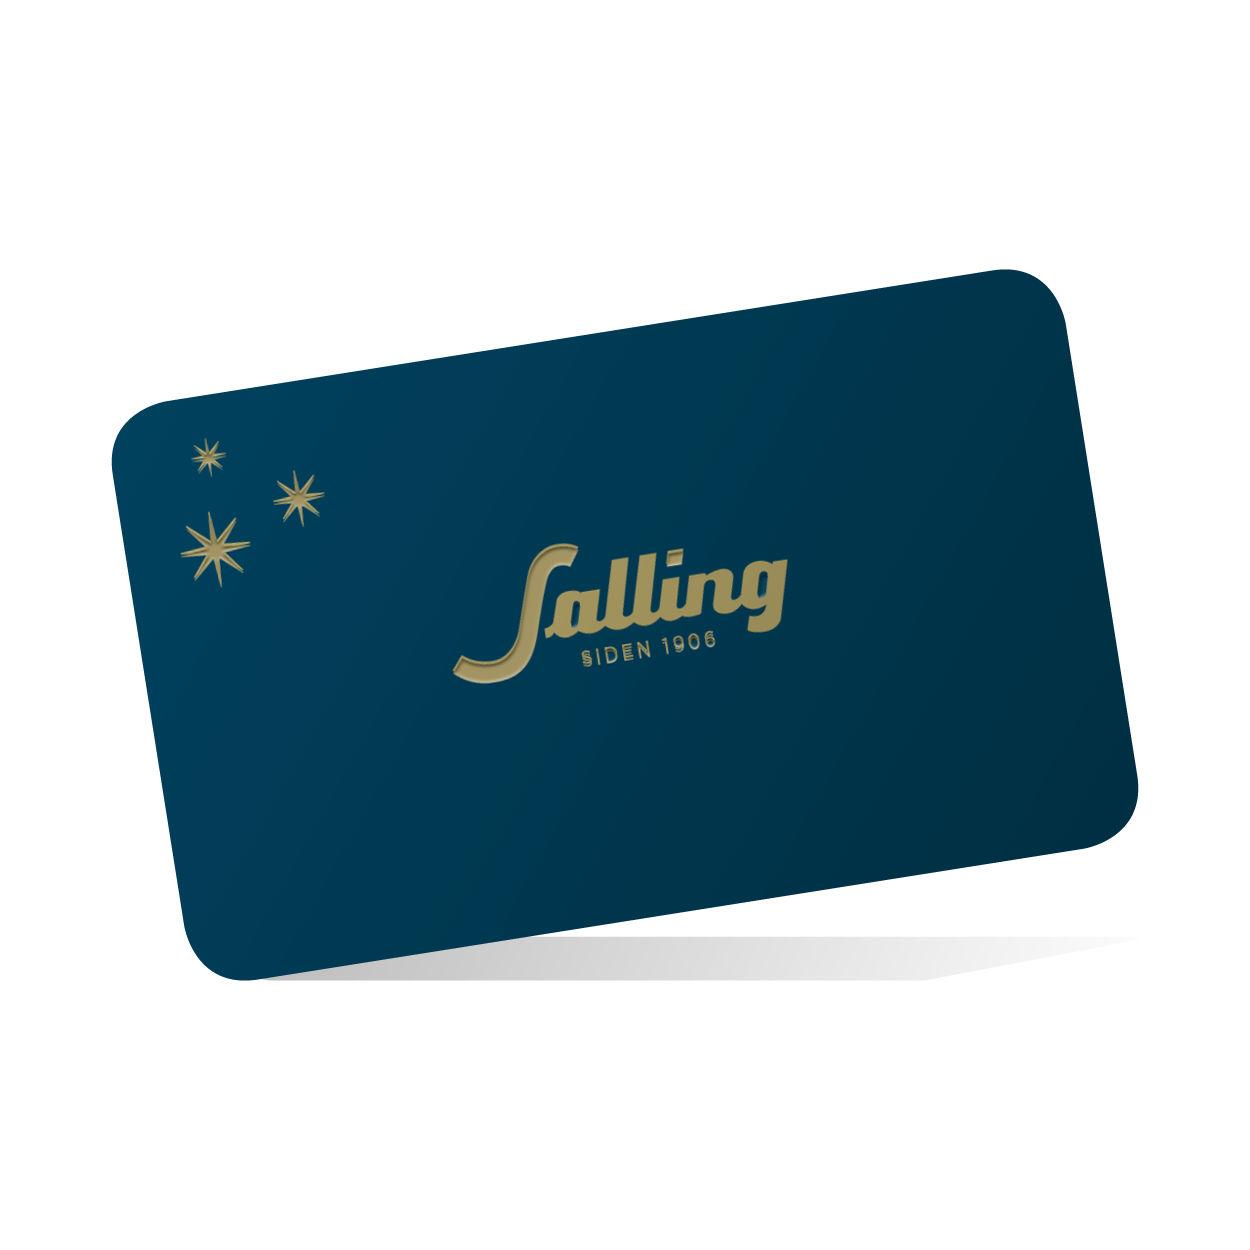 Salling gavekort - 900 kr